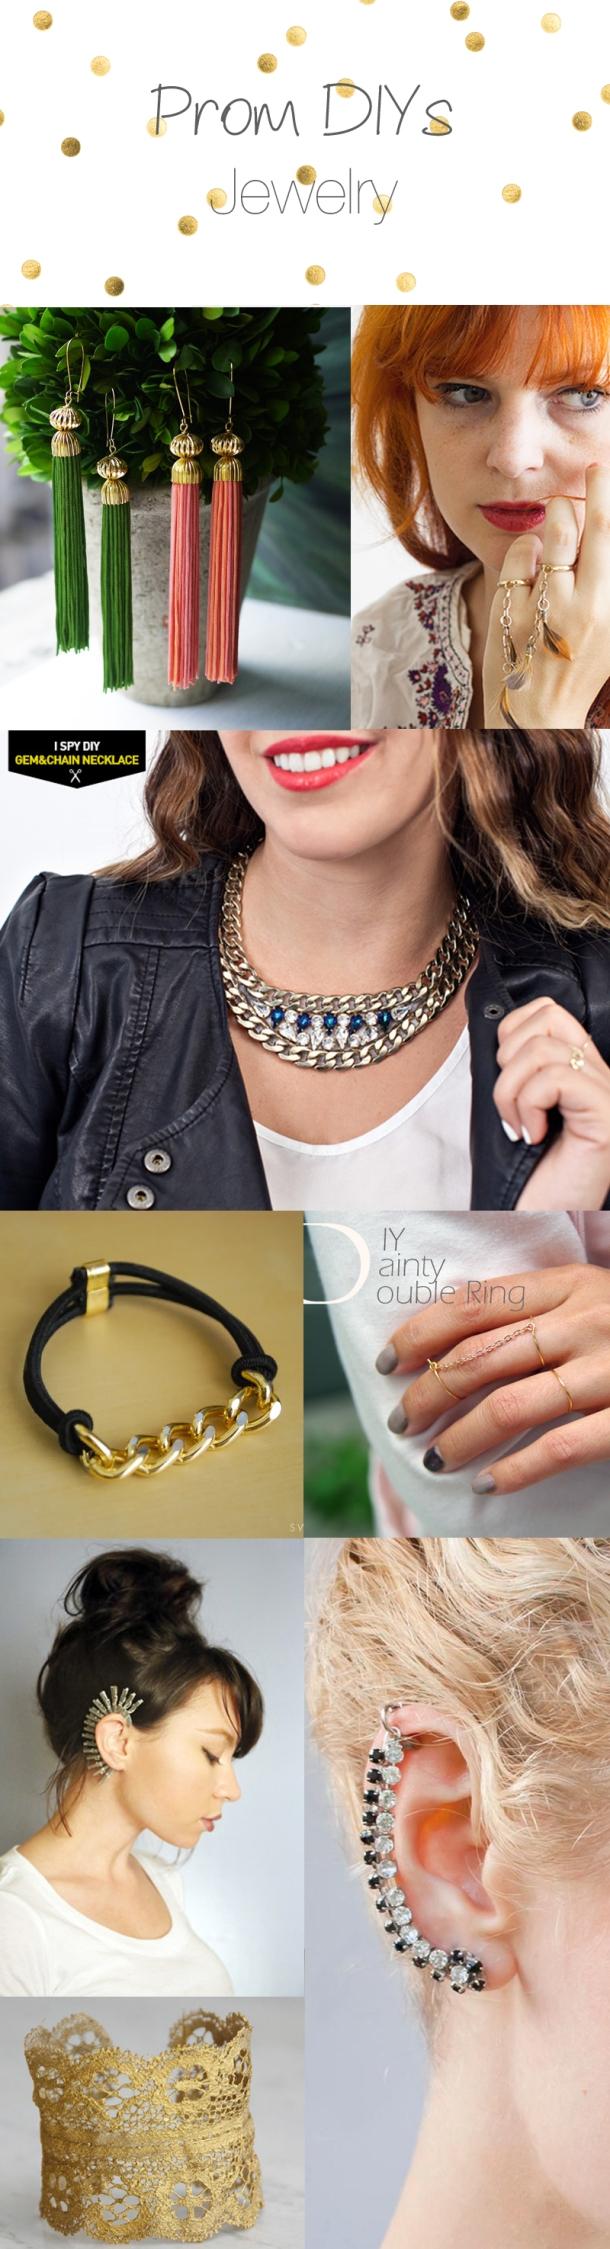 diy-prom-jewelry